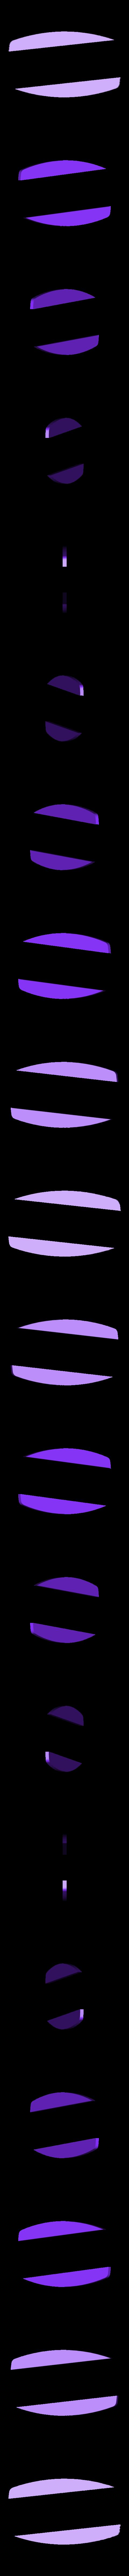 logo_TOTAL_63_bleu.STL Download free STL file TOTAL logo 1963 • 3D printer object, lulu3Dbuilder